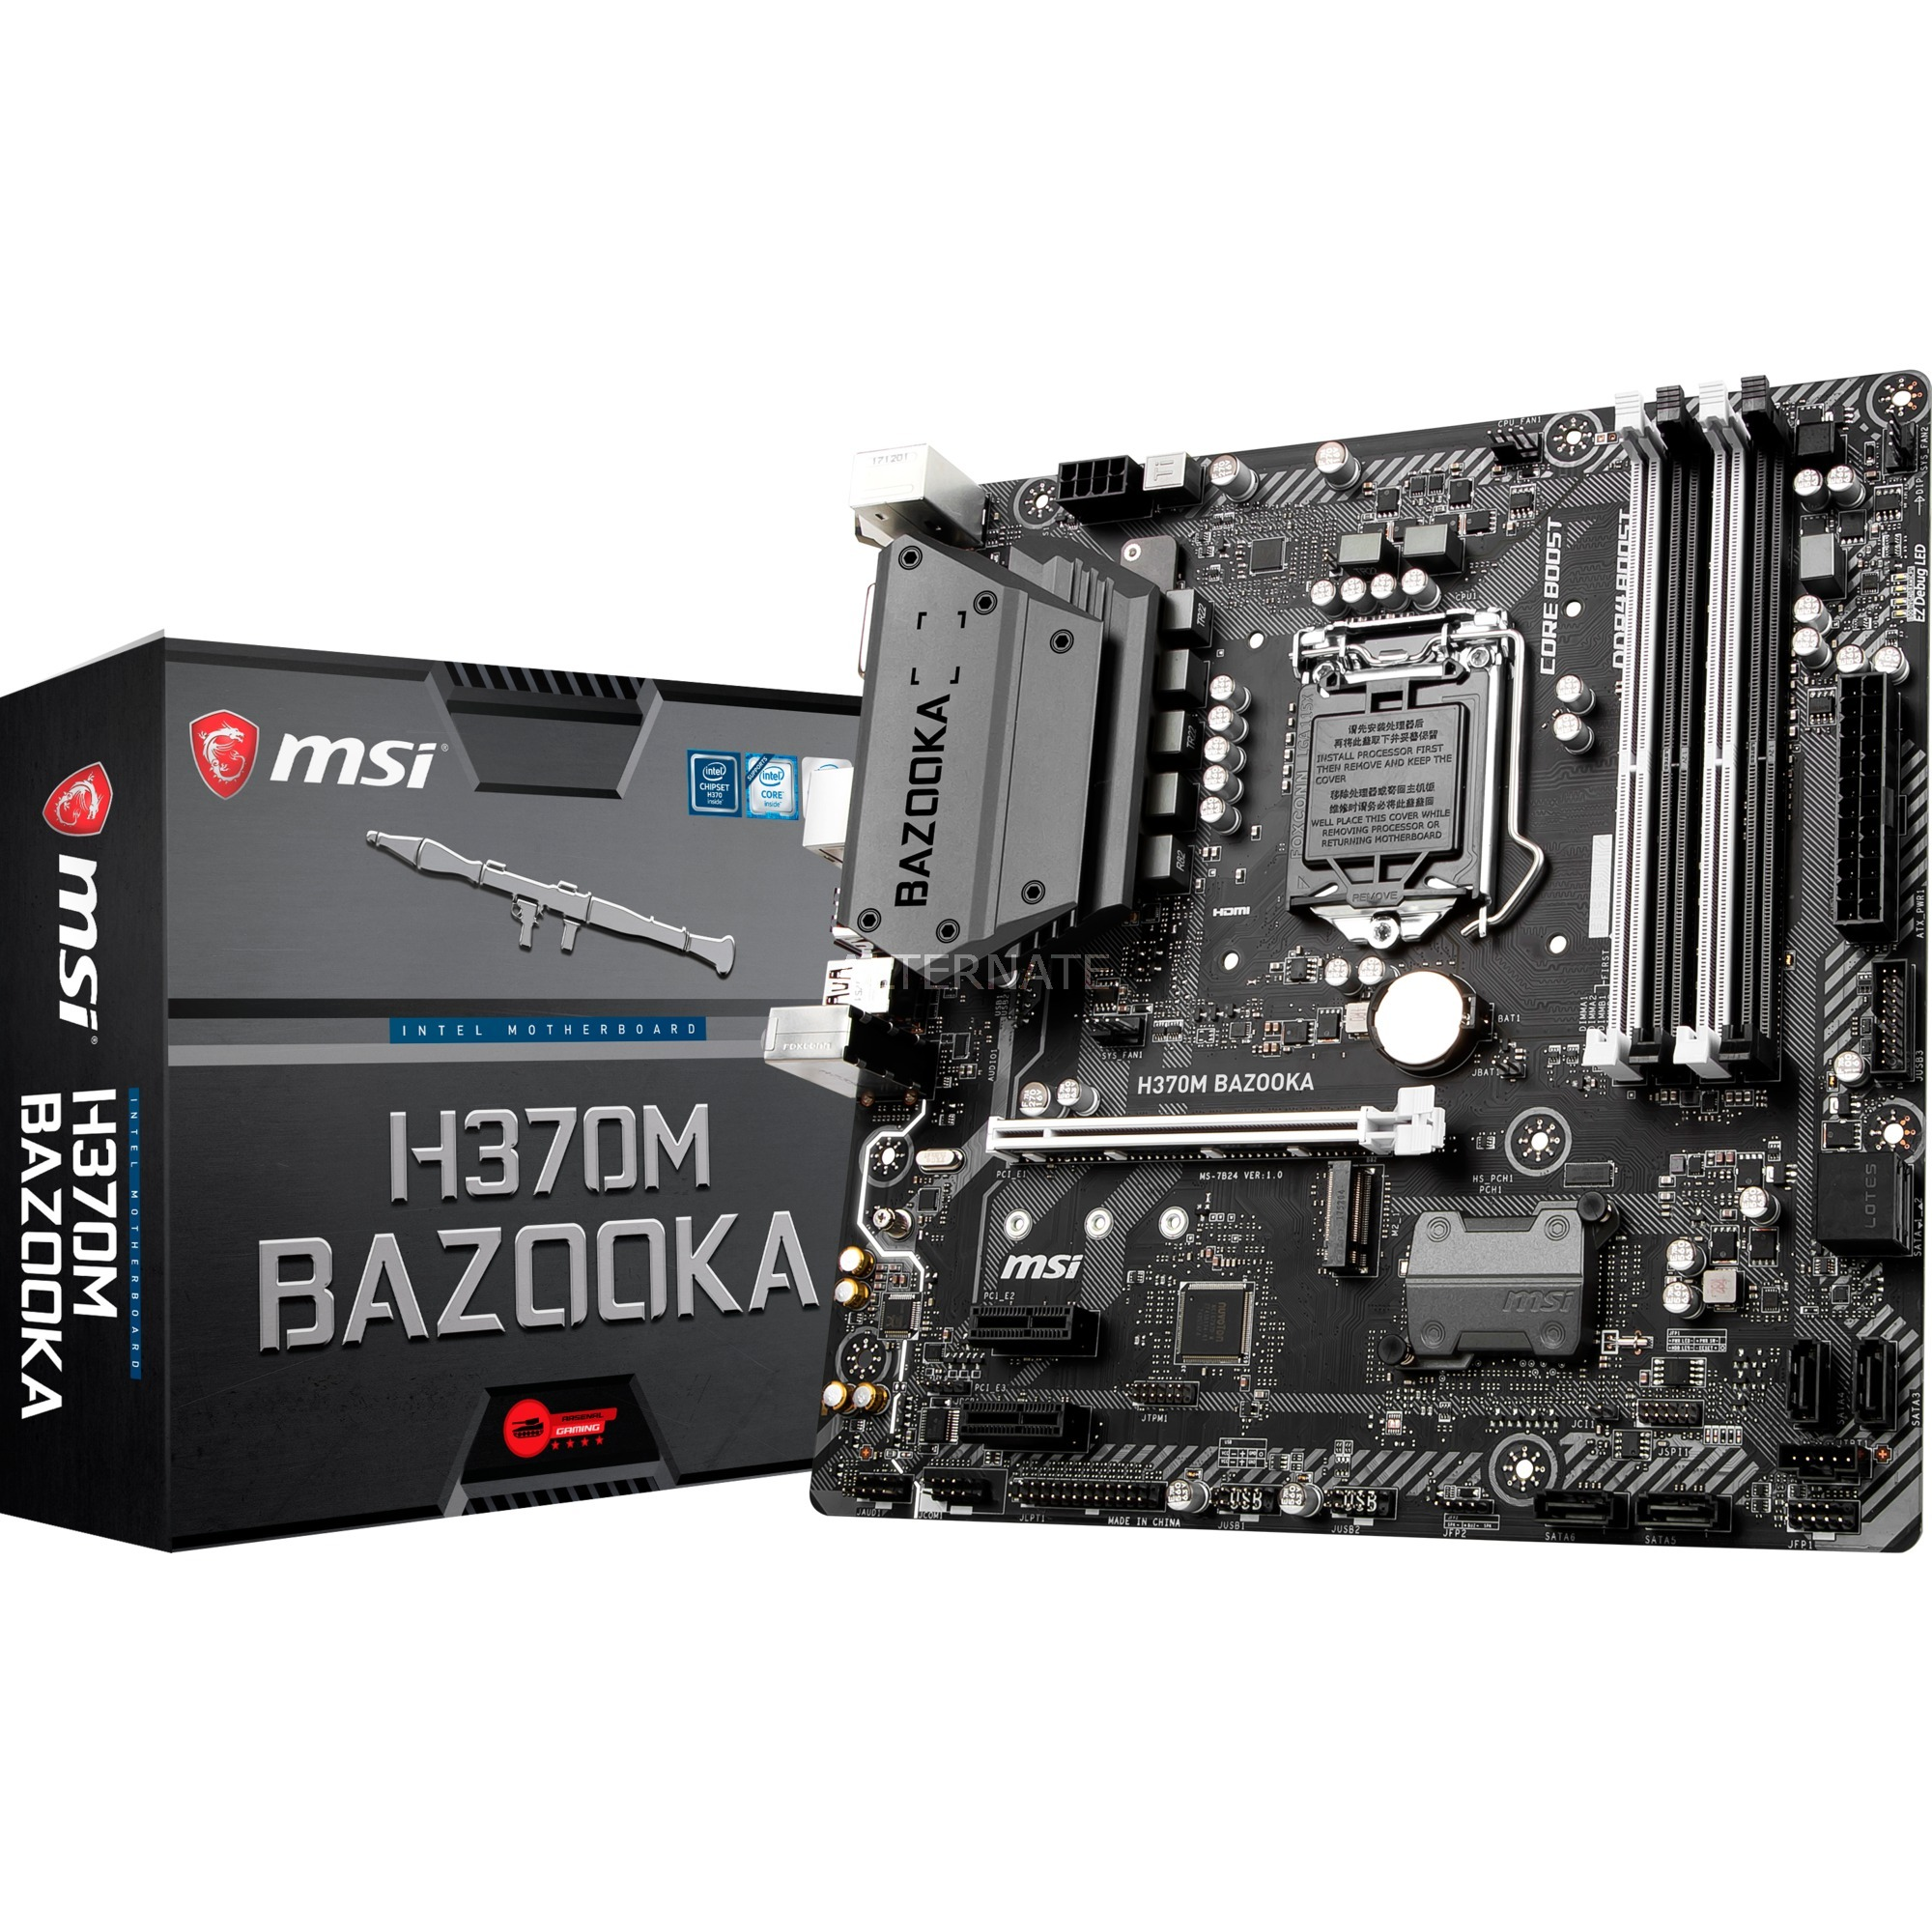 MSI H370M BAZOOKA, Mainboard Gigabit-LAN, Sound, M.2, SATA3, USB 3.0